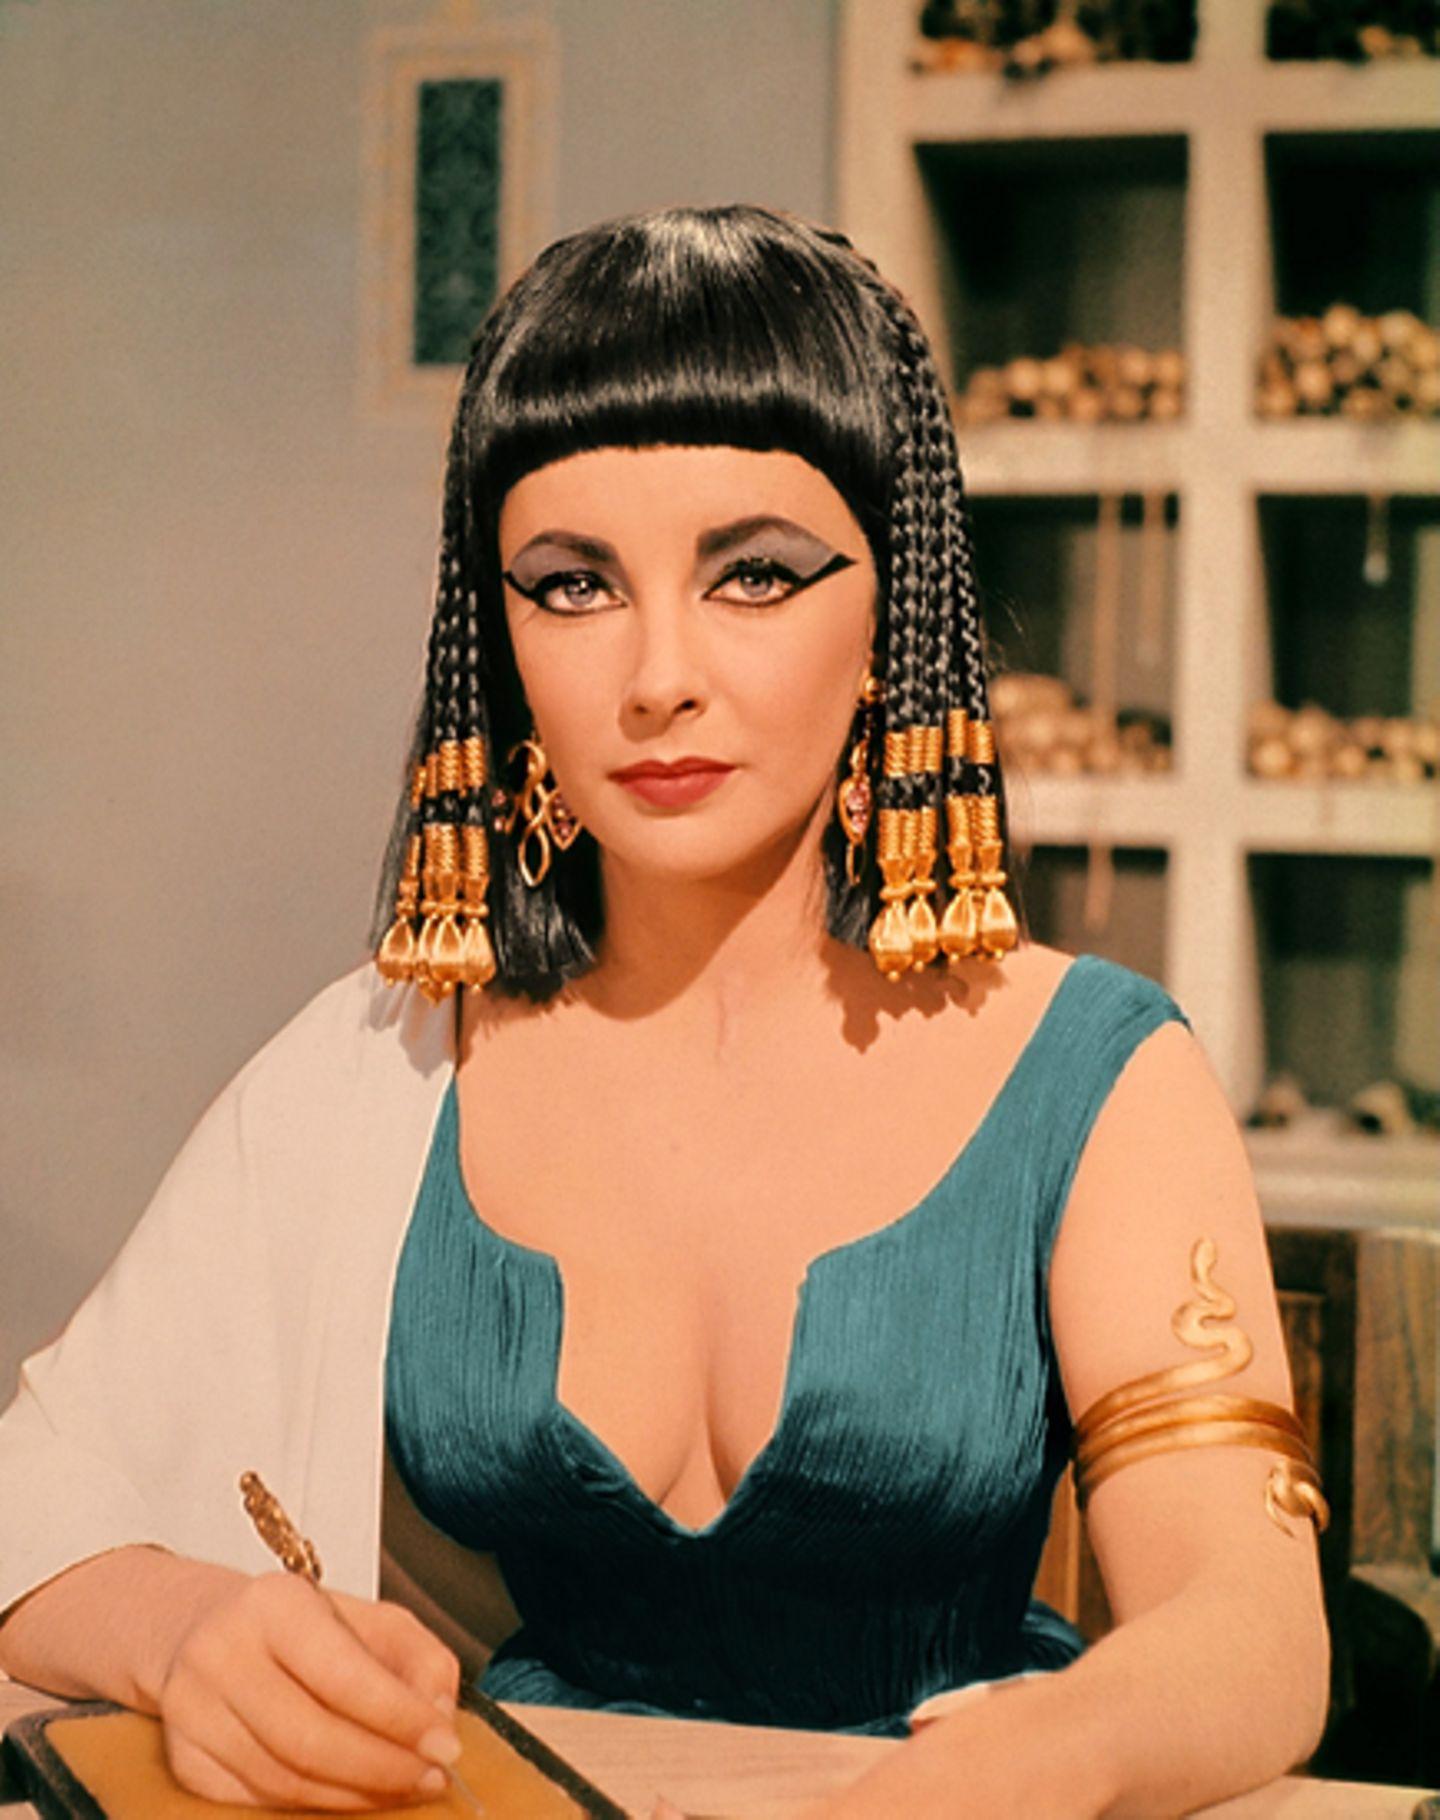 Elizabeth Taylor: Cleopatra (Cleopatra) 1963